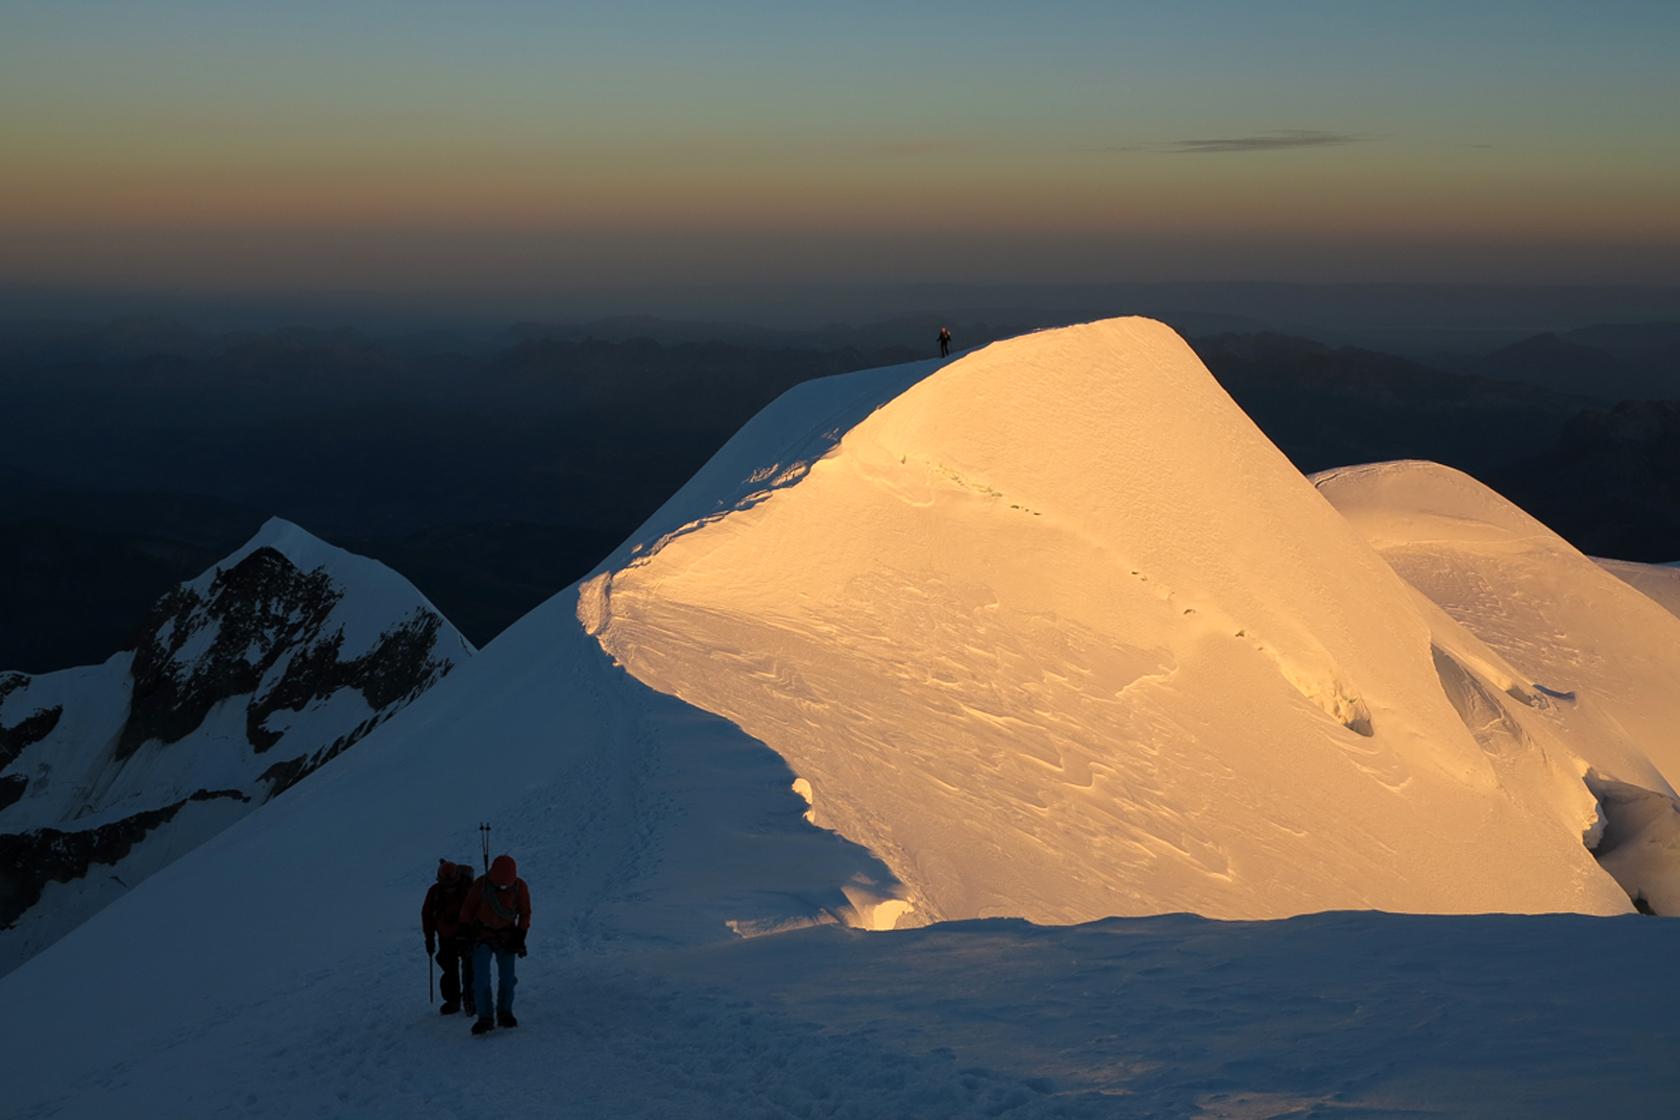 Monte Bianco quota 4810 – Via del Papa